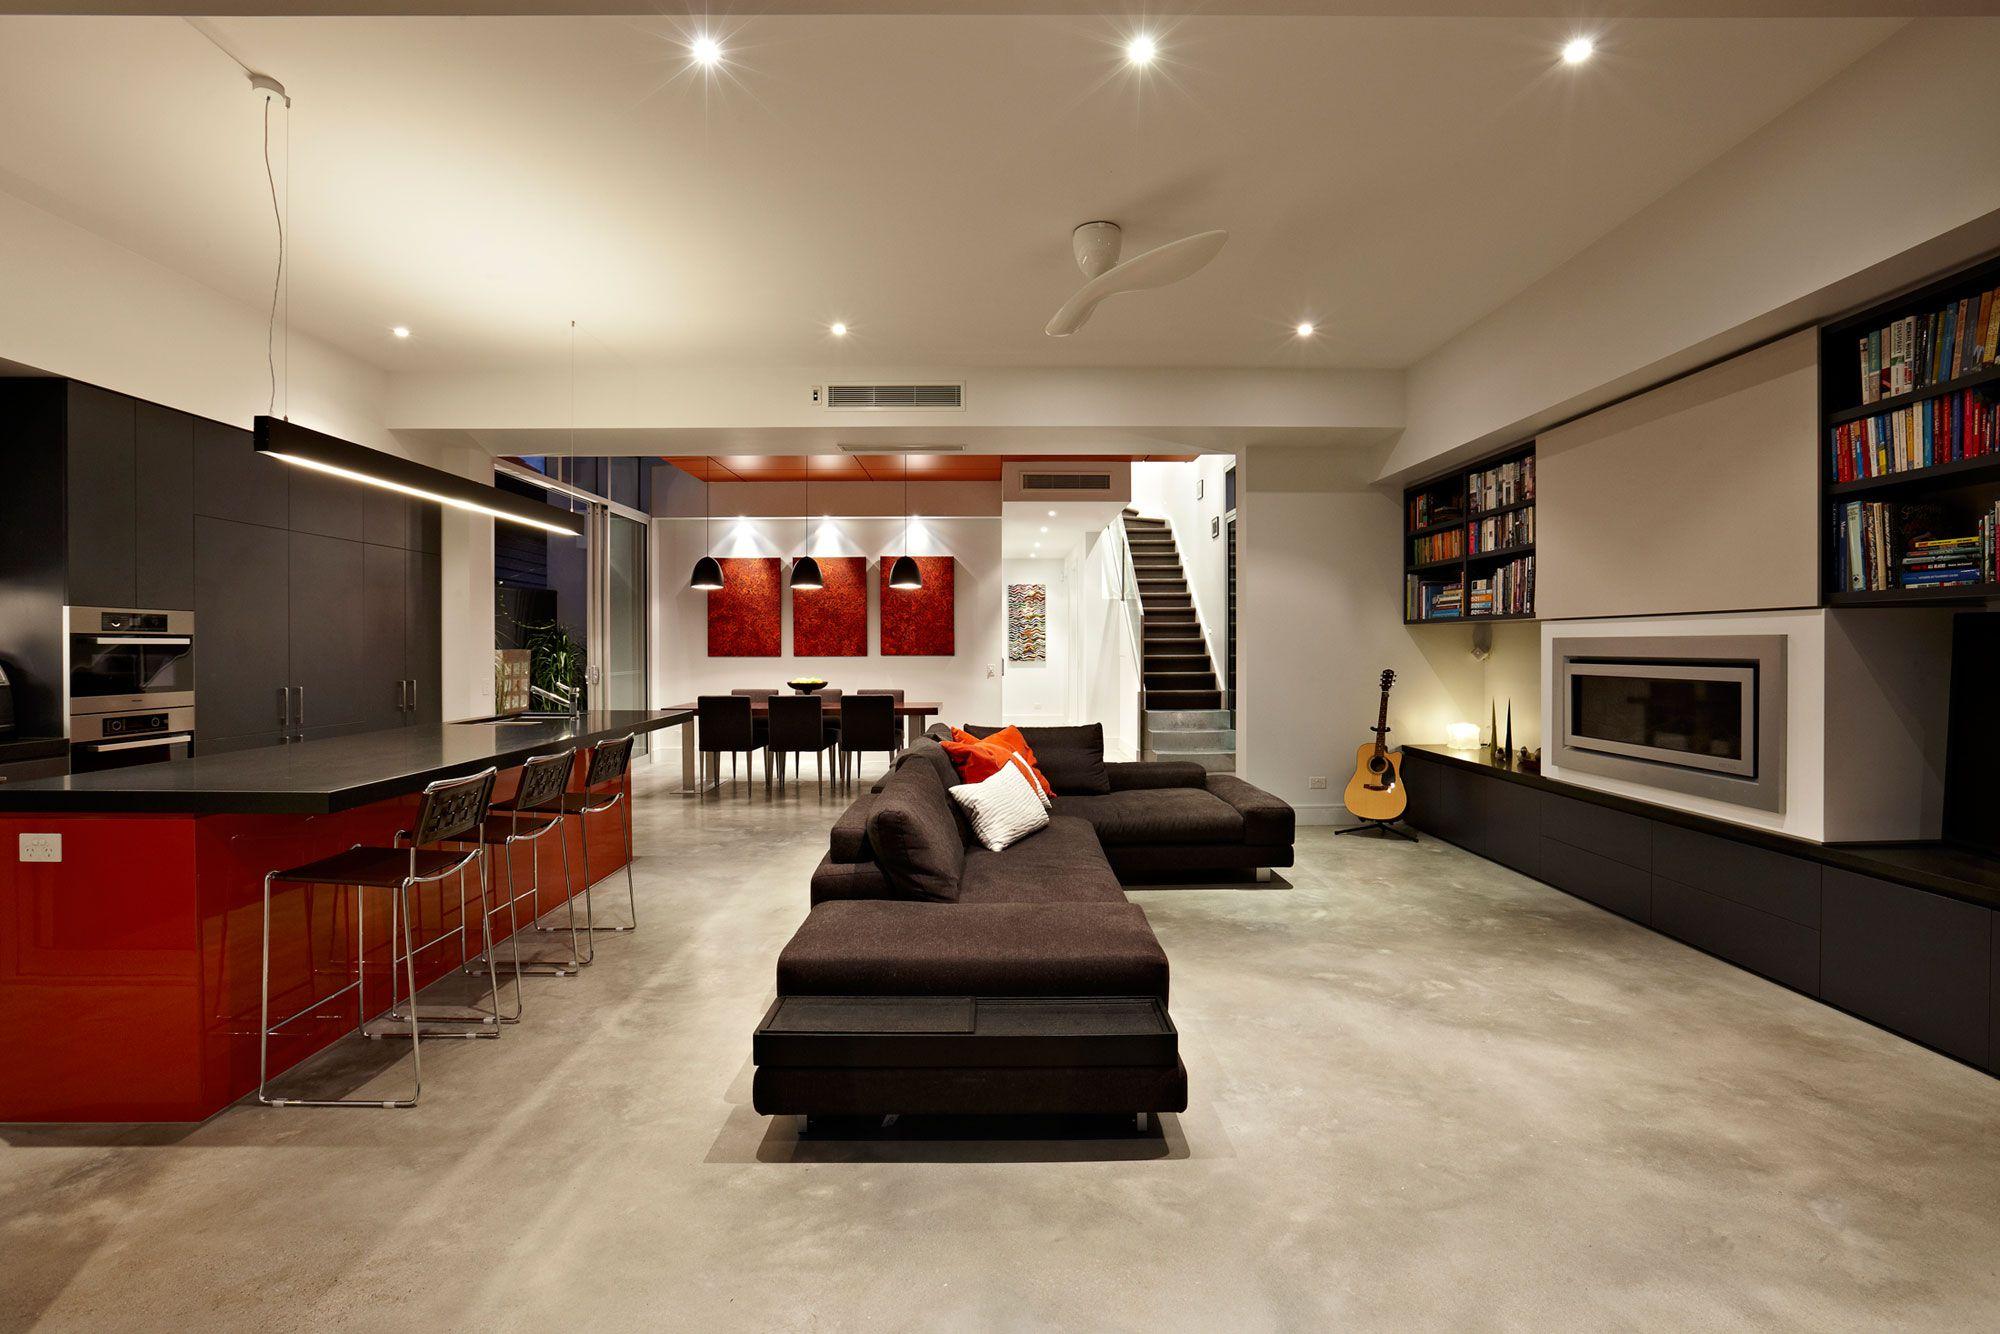 Diseño de casa moderna de dos plantas Planos | Construye ... on Interiores De Casas Modernas  id=46238